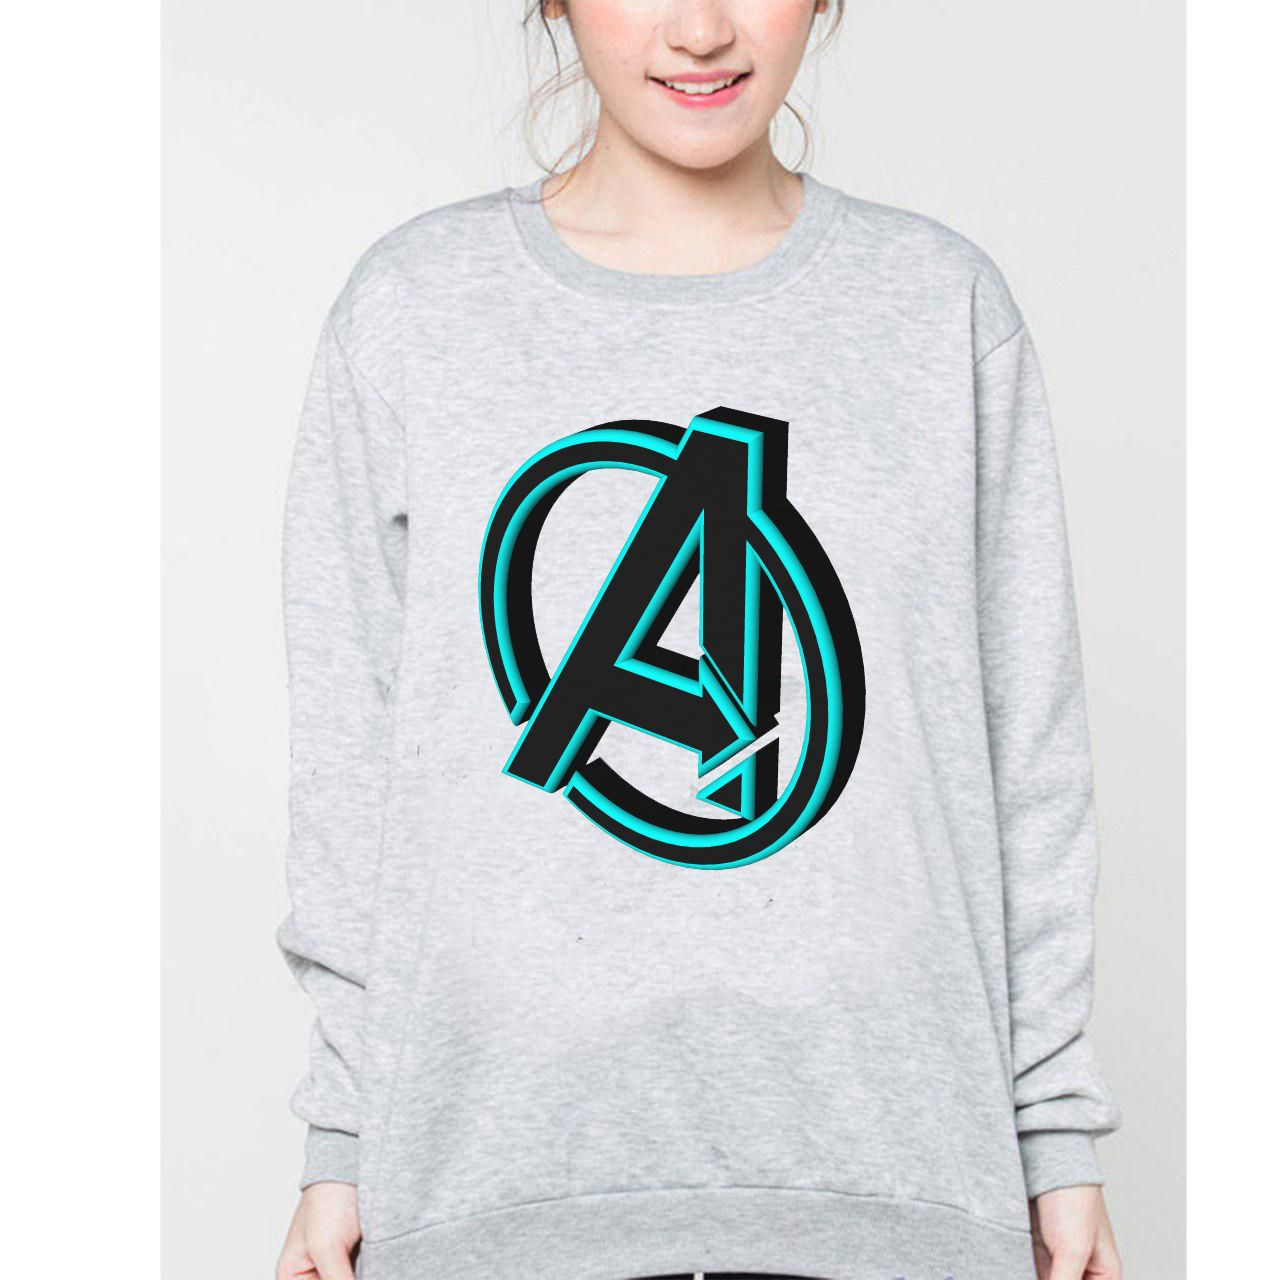 6fafefd784d9 Avengers EndGame Logo Cheap Graphic Tees Sweatshirt Unisex